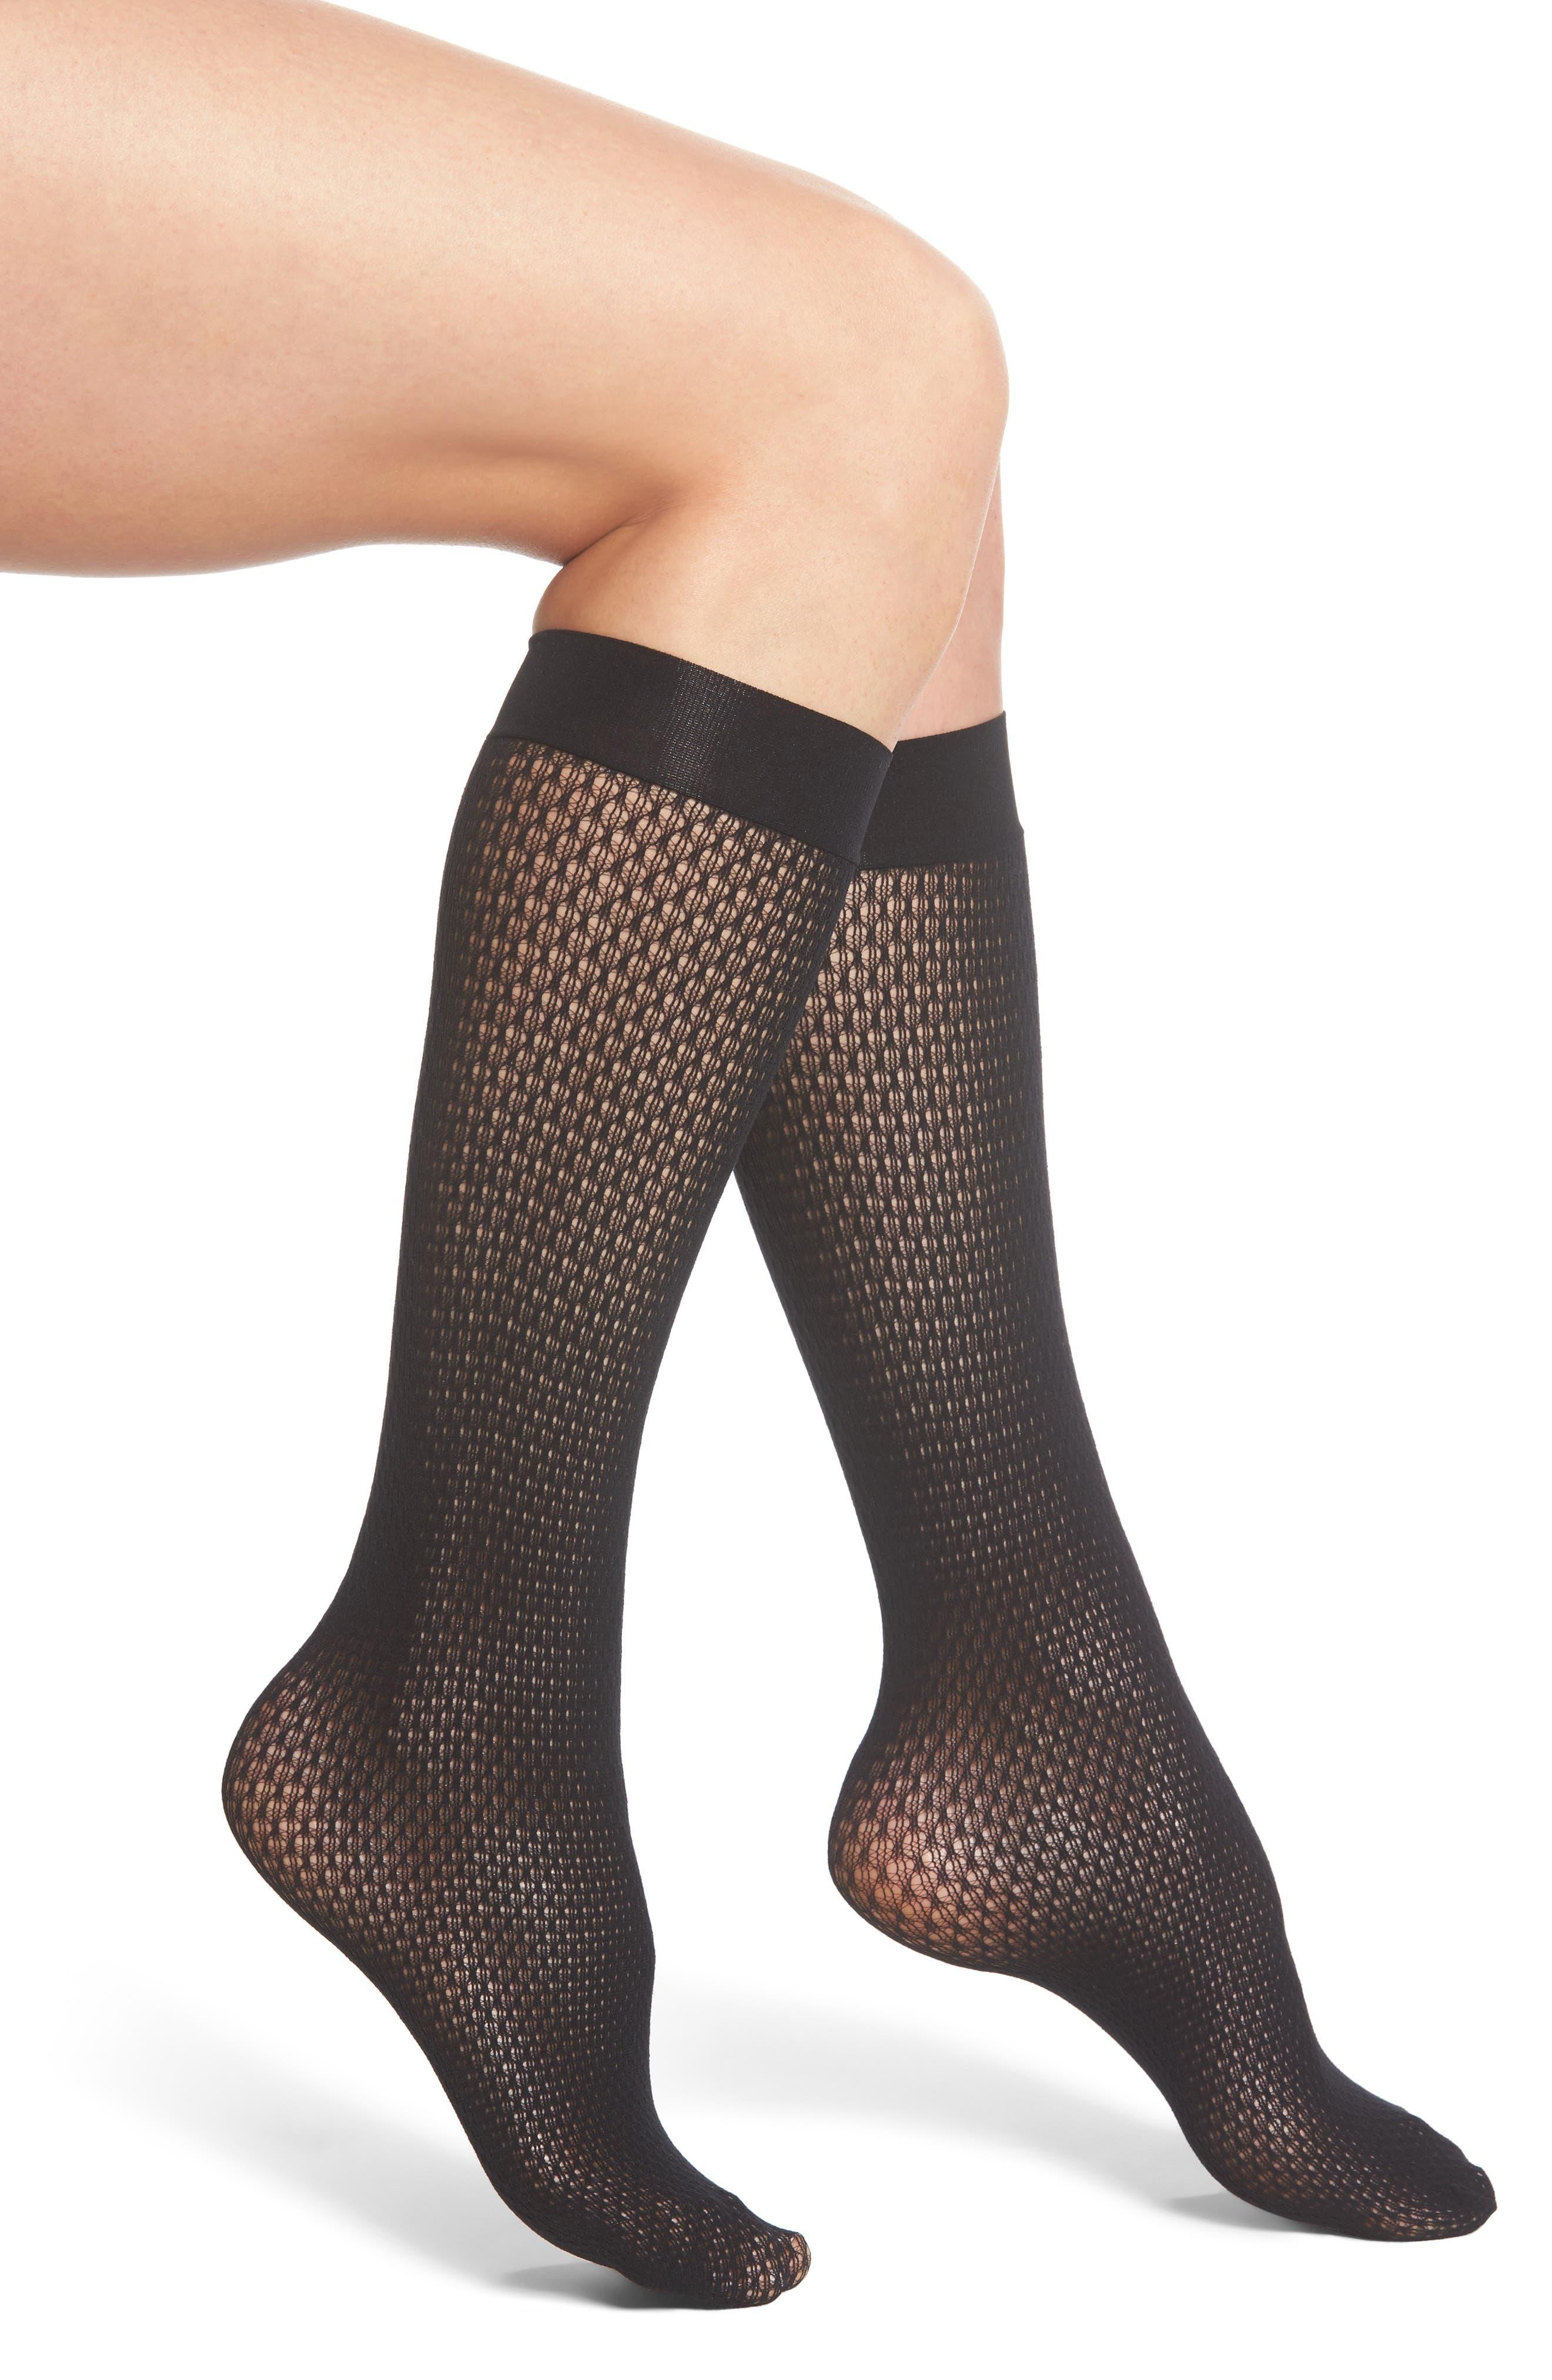 Alternate Image 1 Selected - Wolford Rhomb Net Knee High Stockings